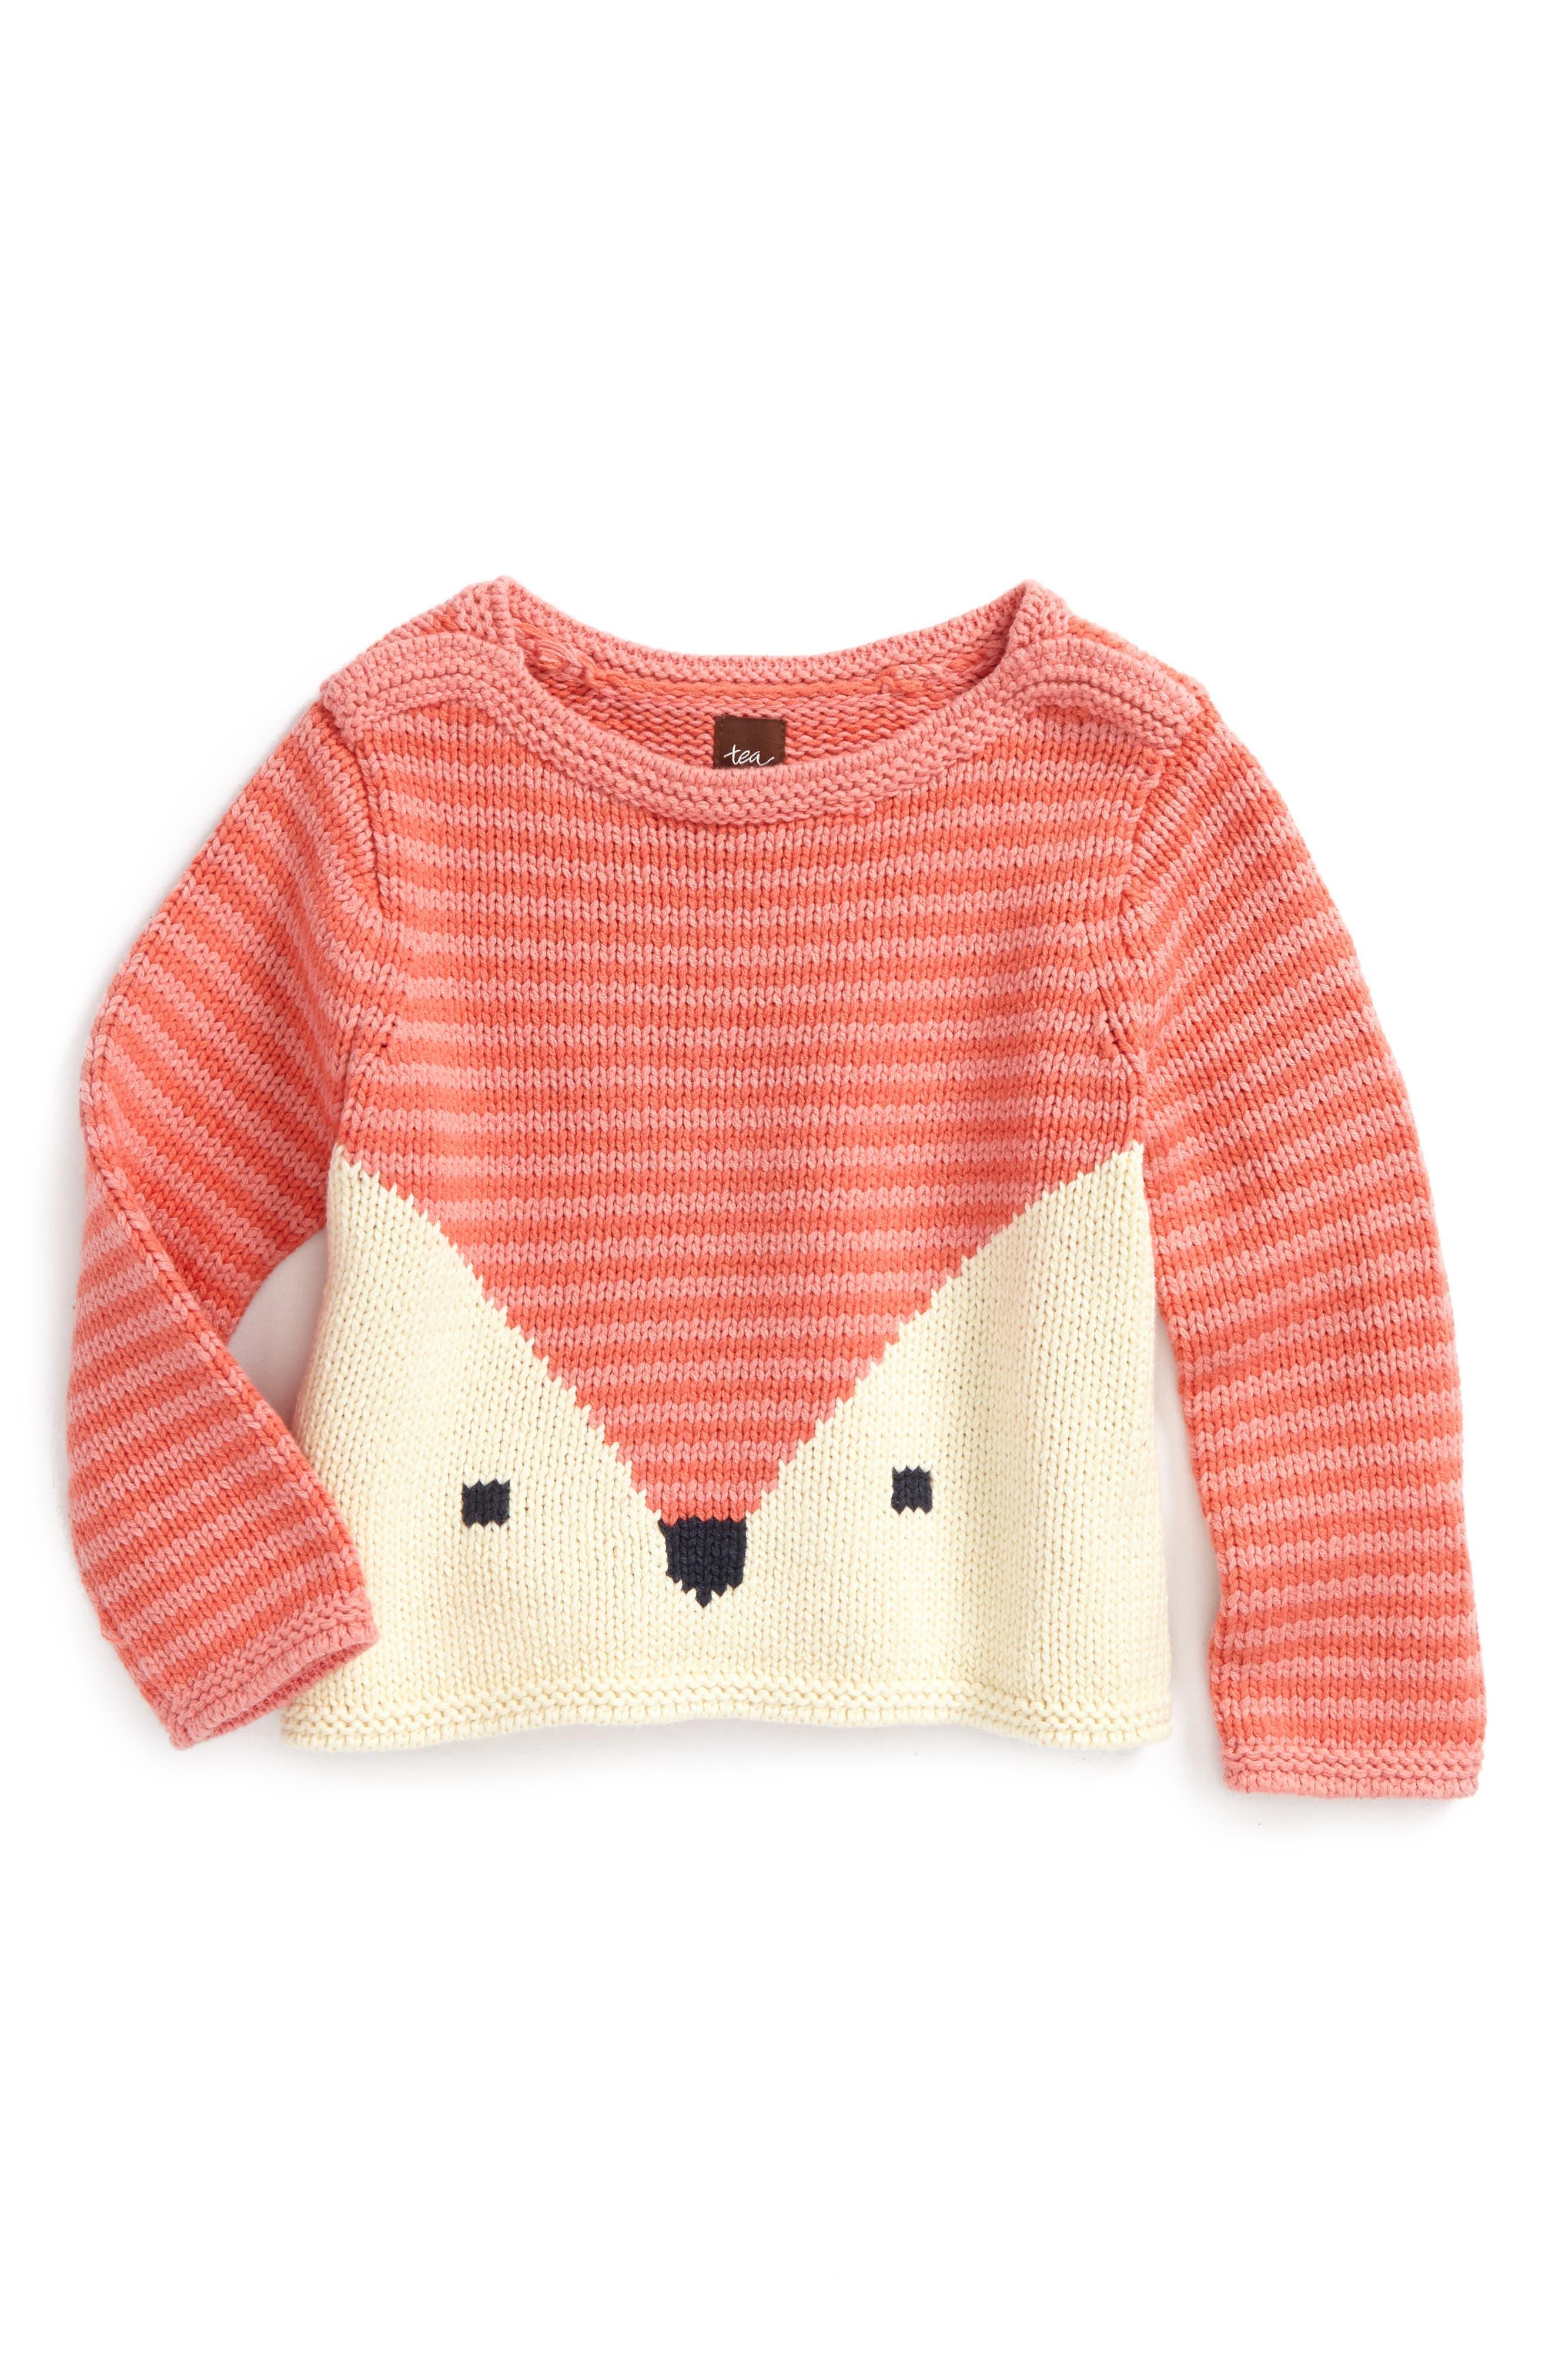 Fox Sweater,                             Main thumbnail 1, color,                             950